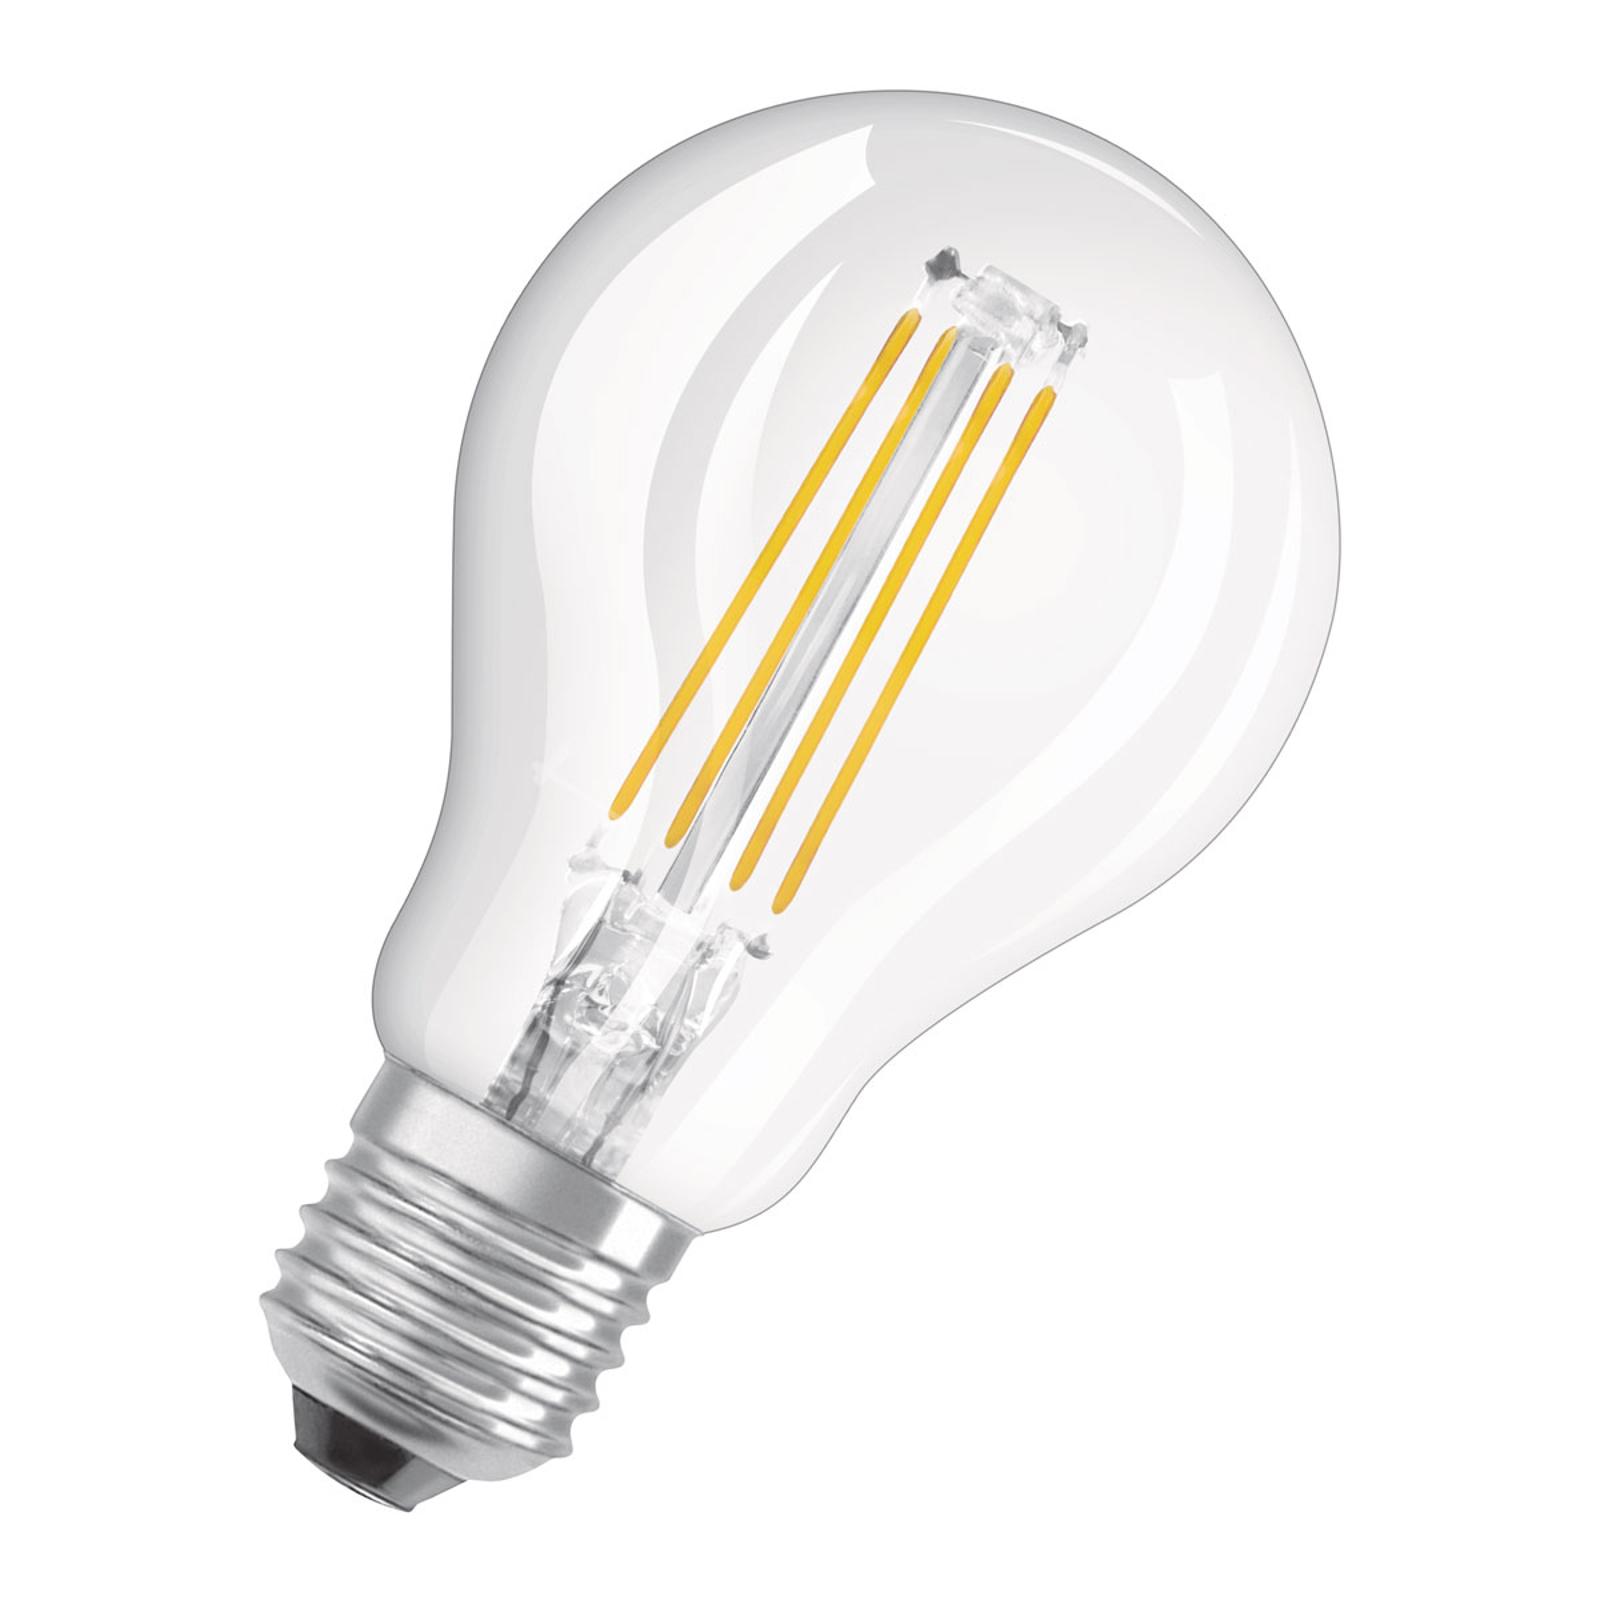 OSRAM LED-Tropfenlampe E27 Superstar 5W klar 2.700